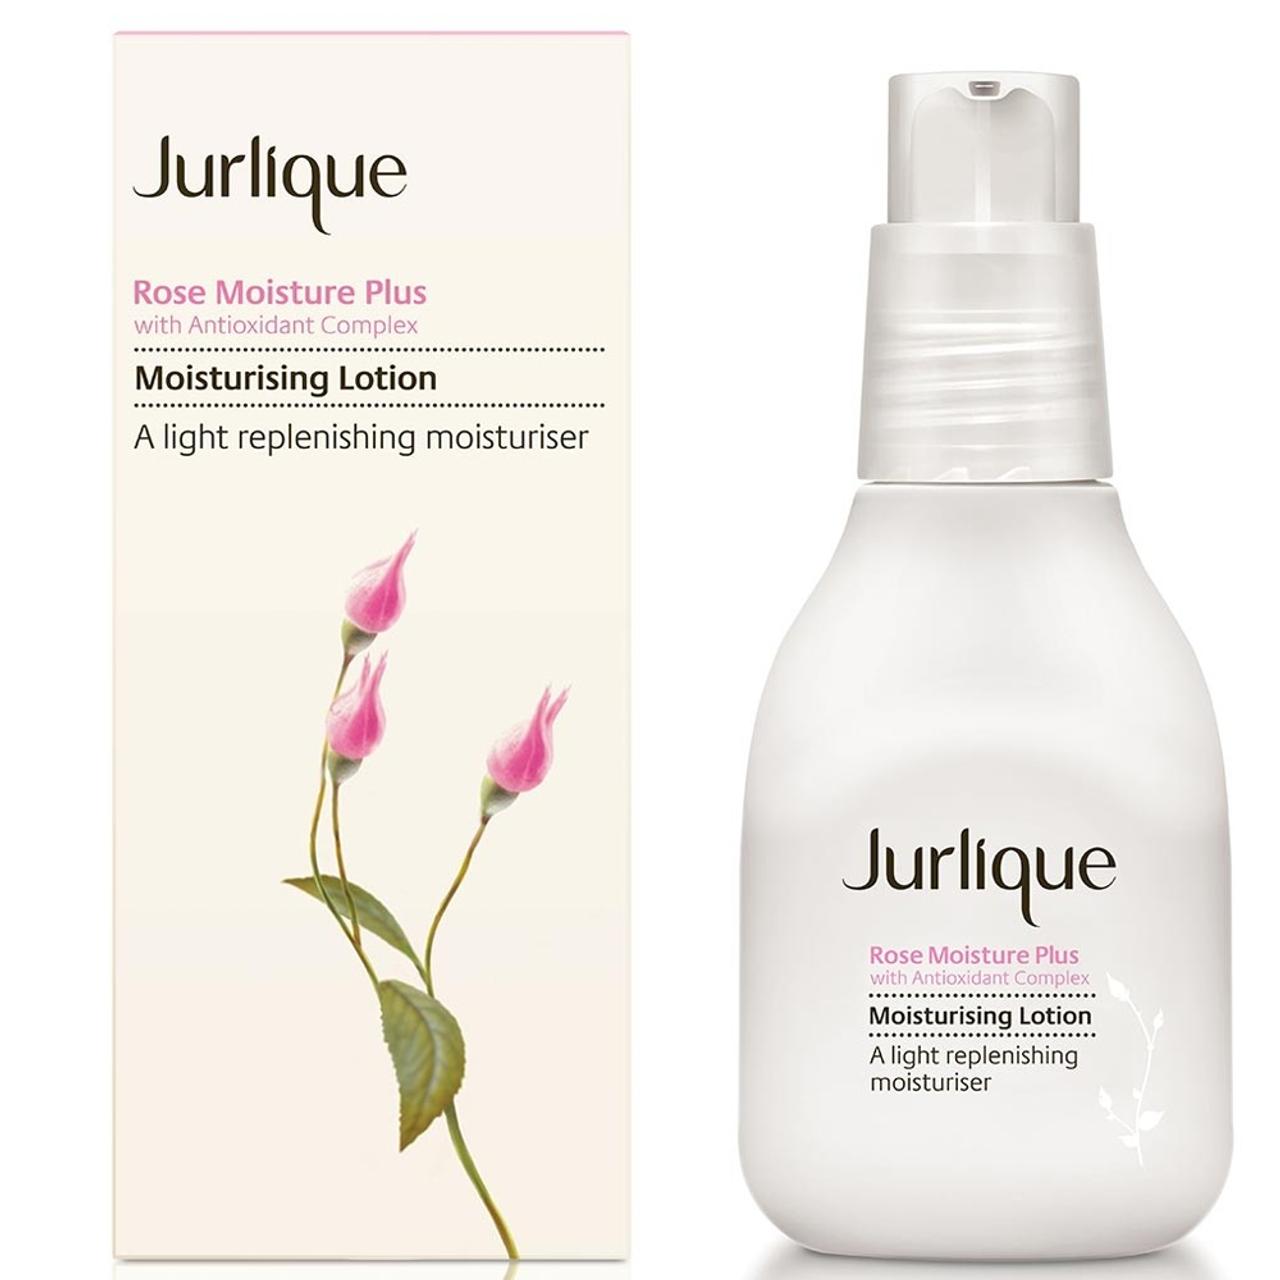 Jurlique Rose Moisture Plus Moisturizing Lotion